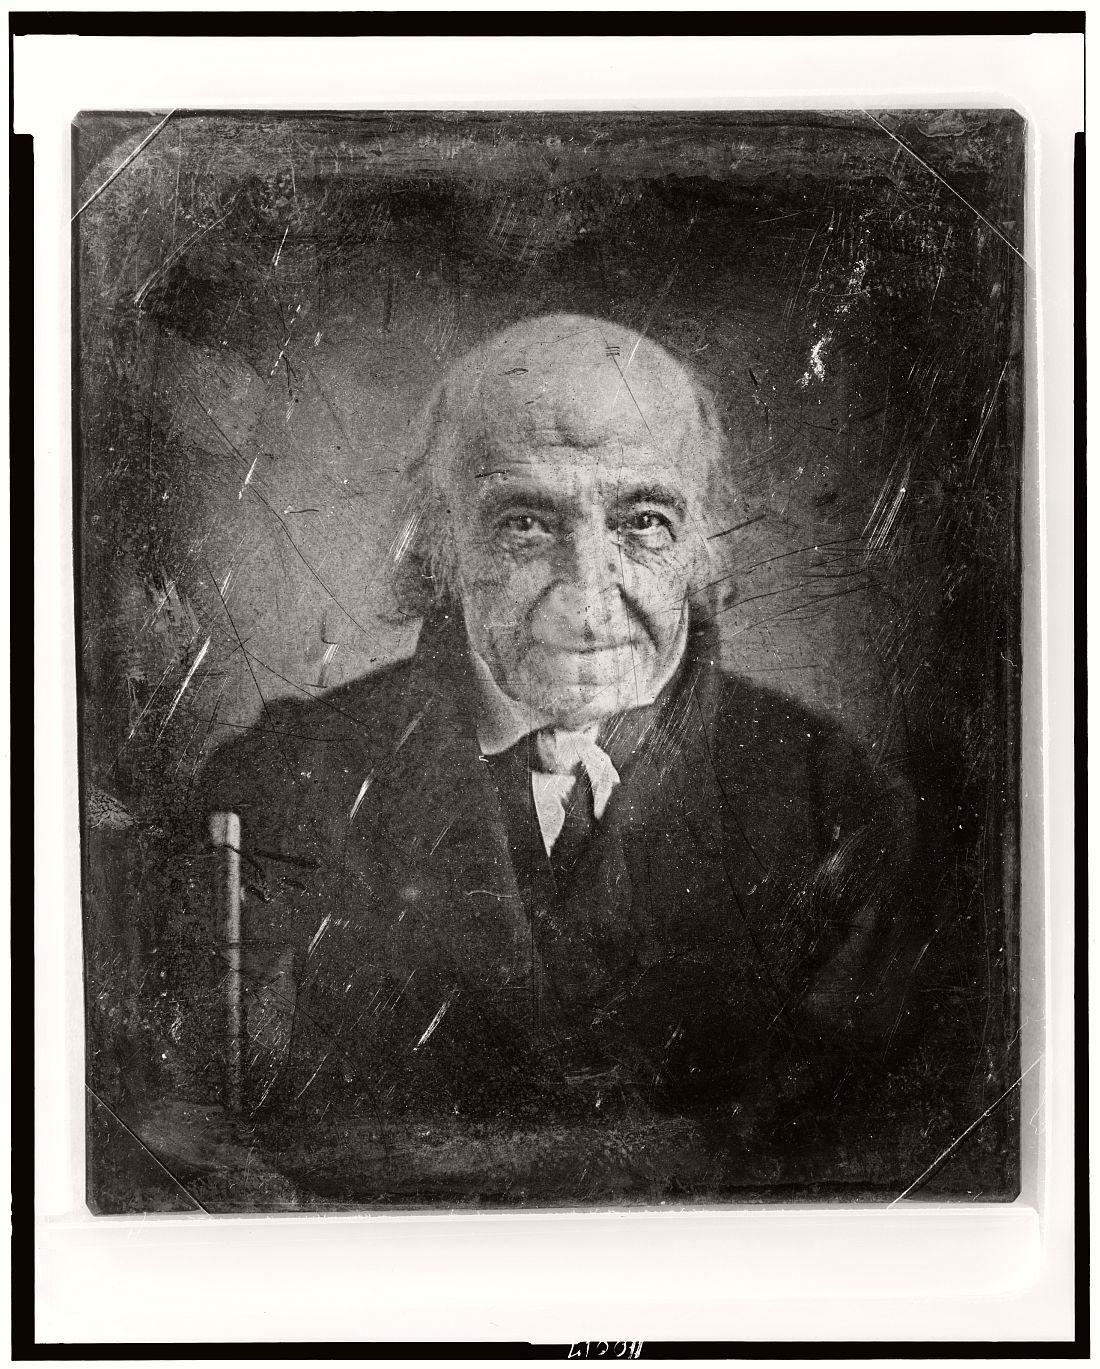 vintage-daguerreotype-portraits-from-xix-century-1844-1860-48